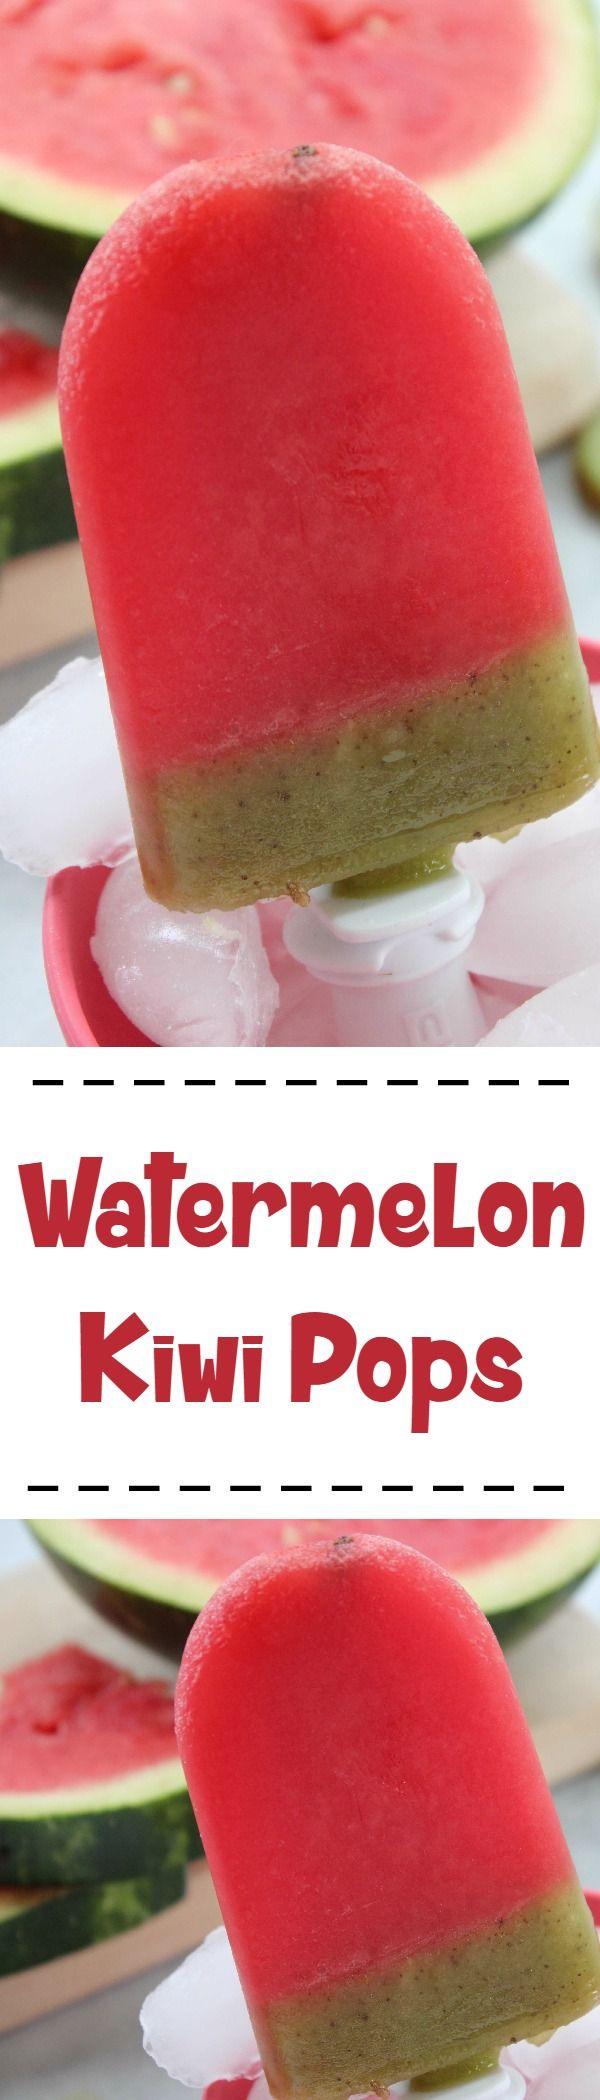 Watermelon Kiwi Pops Recipe  :: Refreshing and fun summer fruit pop recipe!